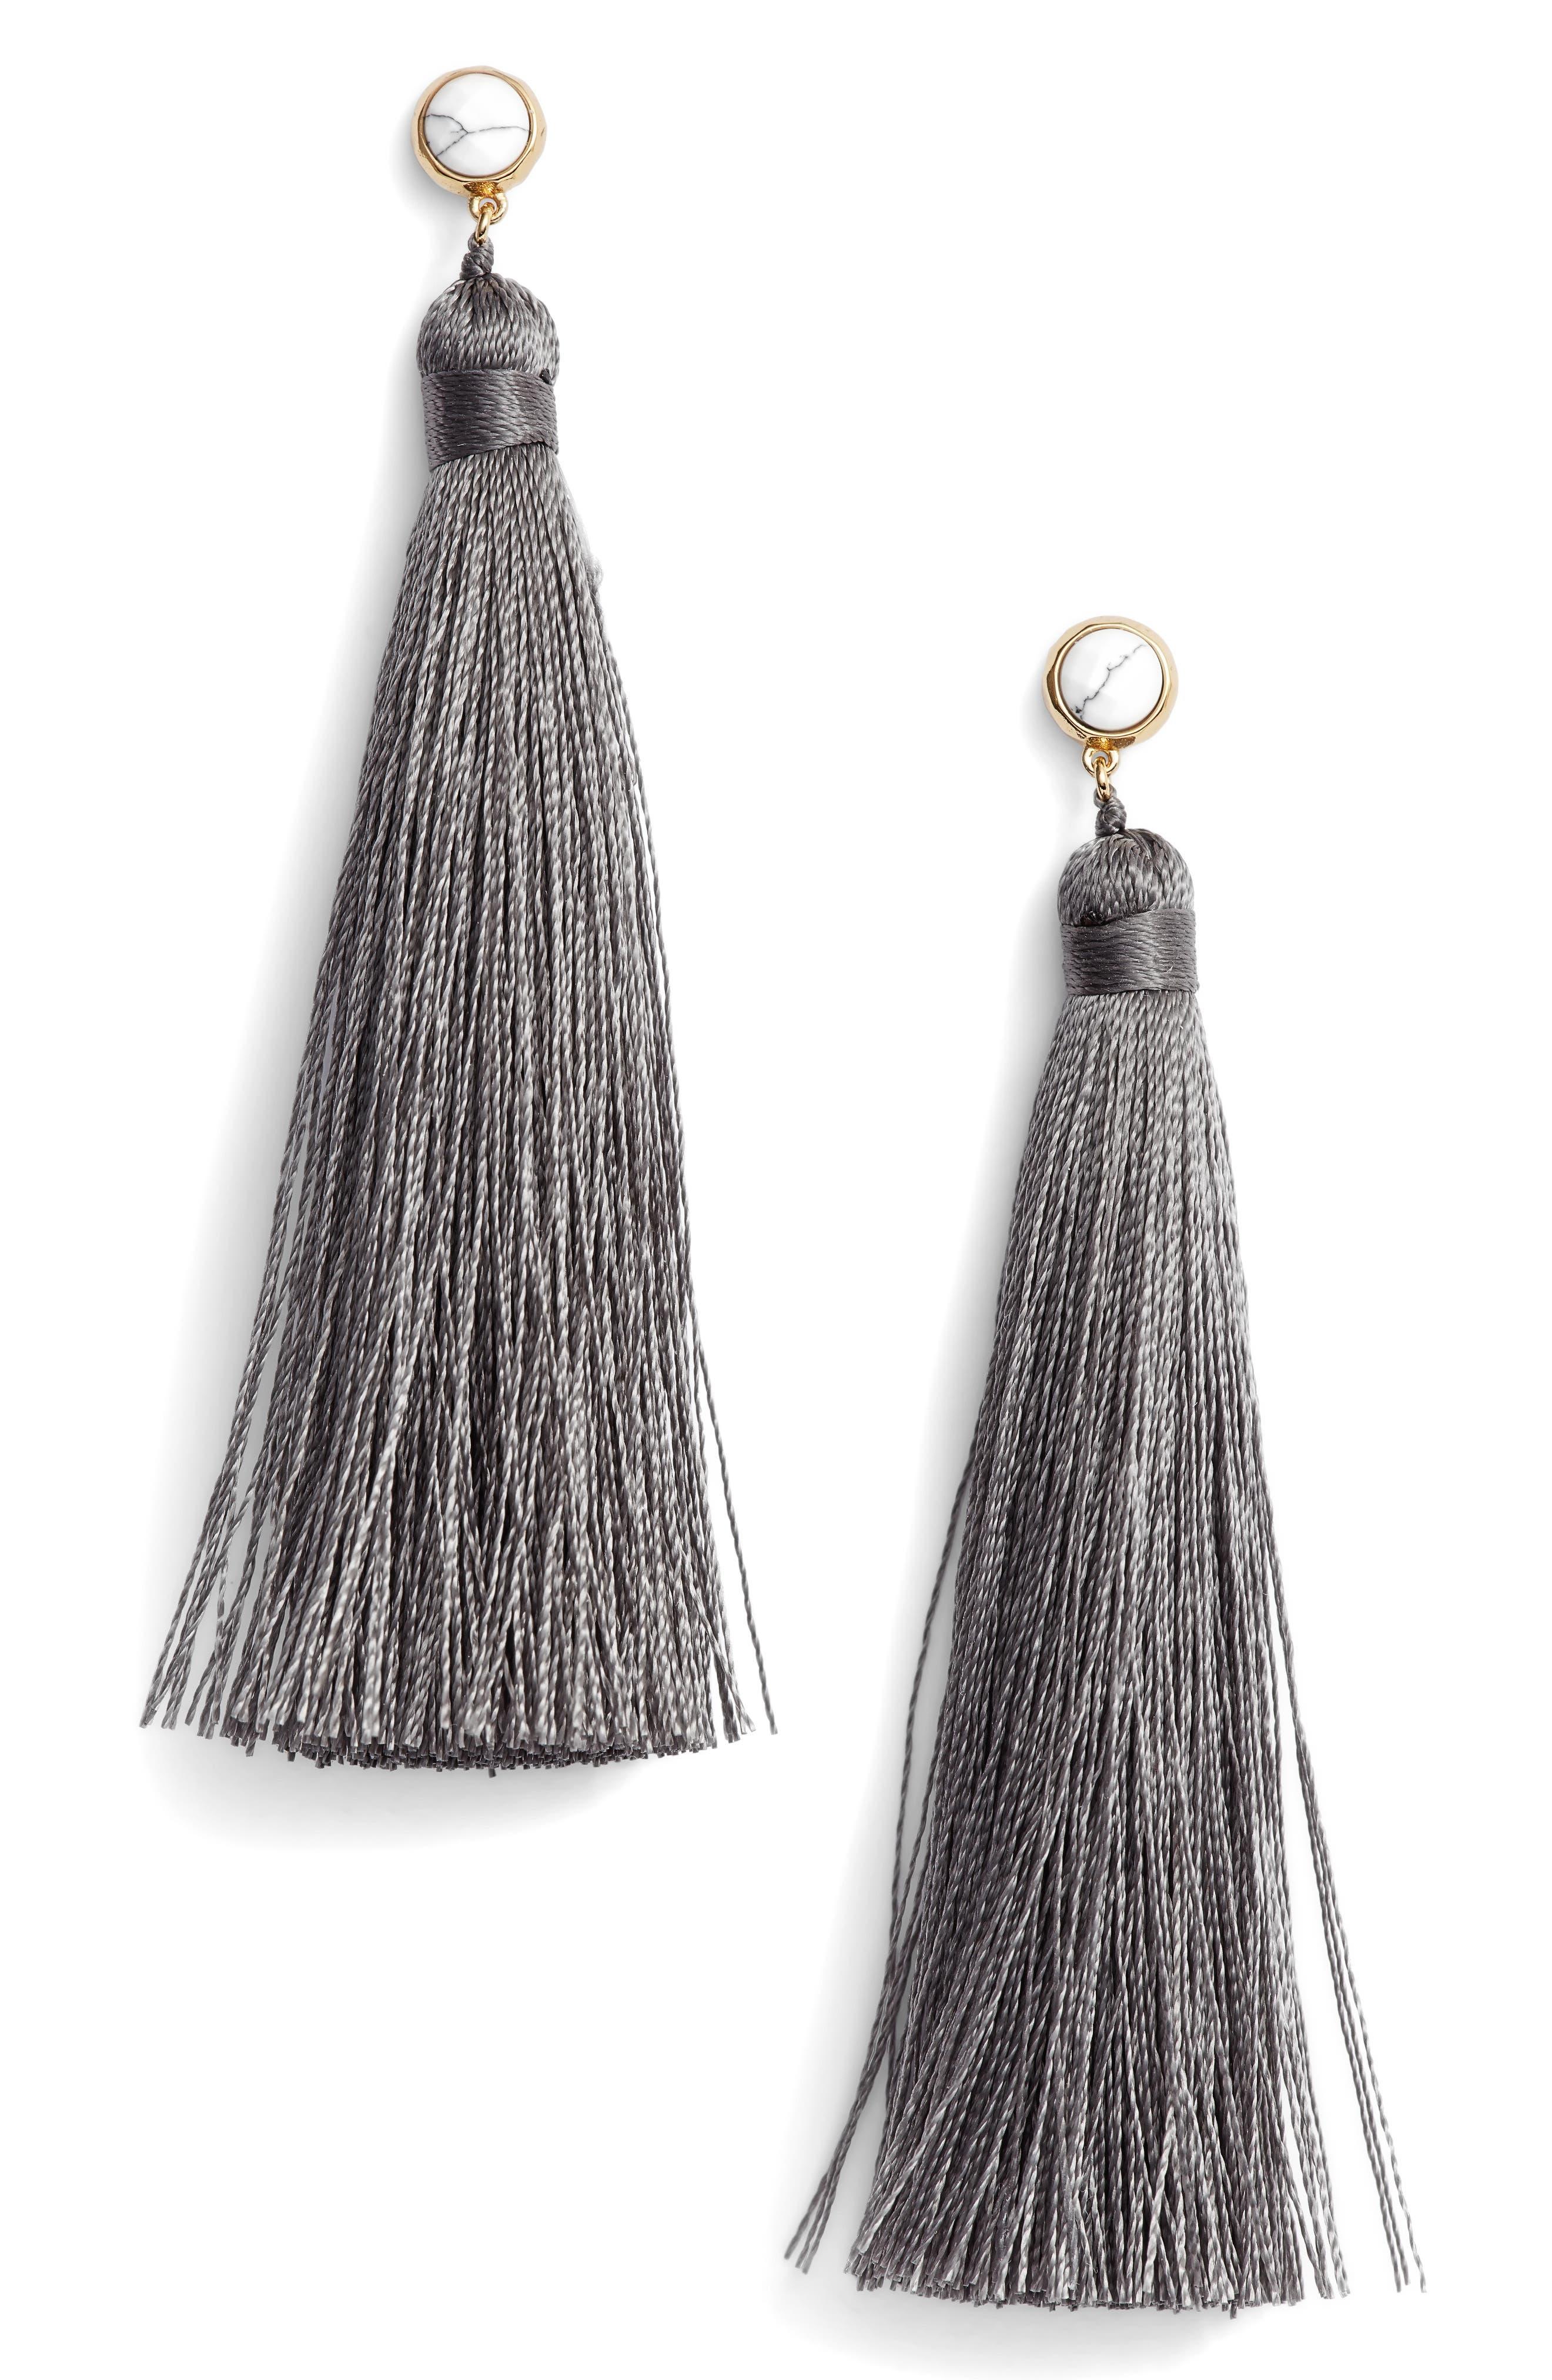 Tulum Tassel Earrings,                         Main,                         color, 020